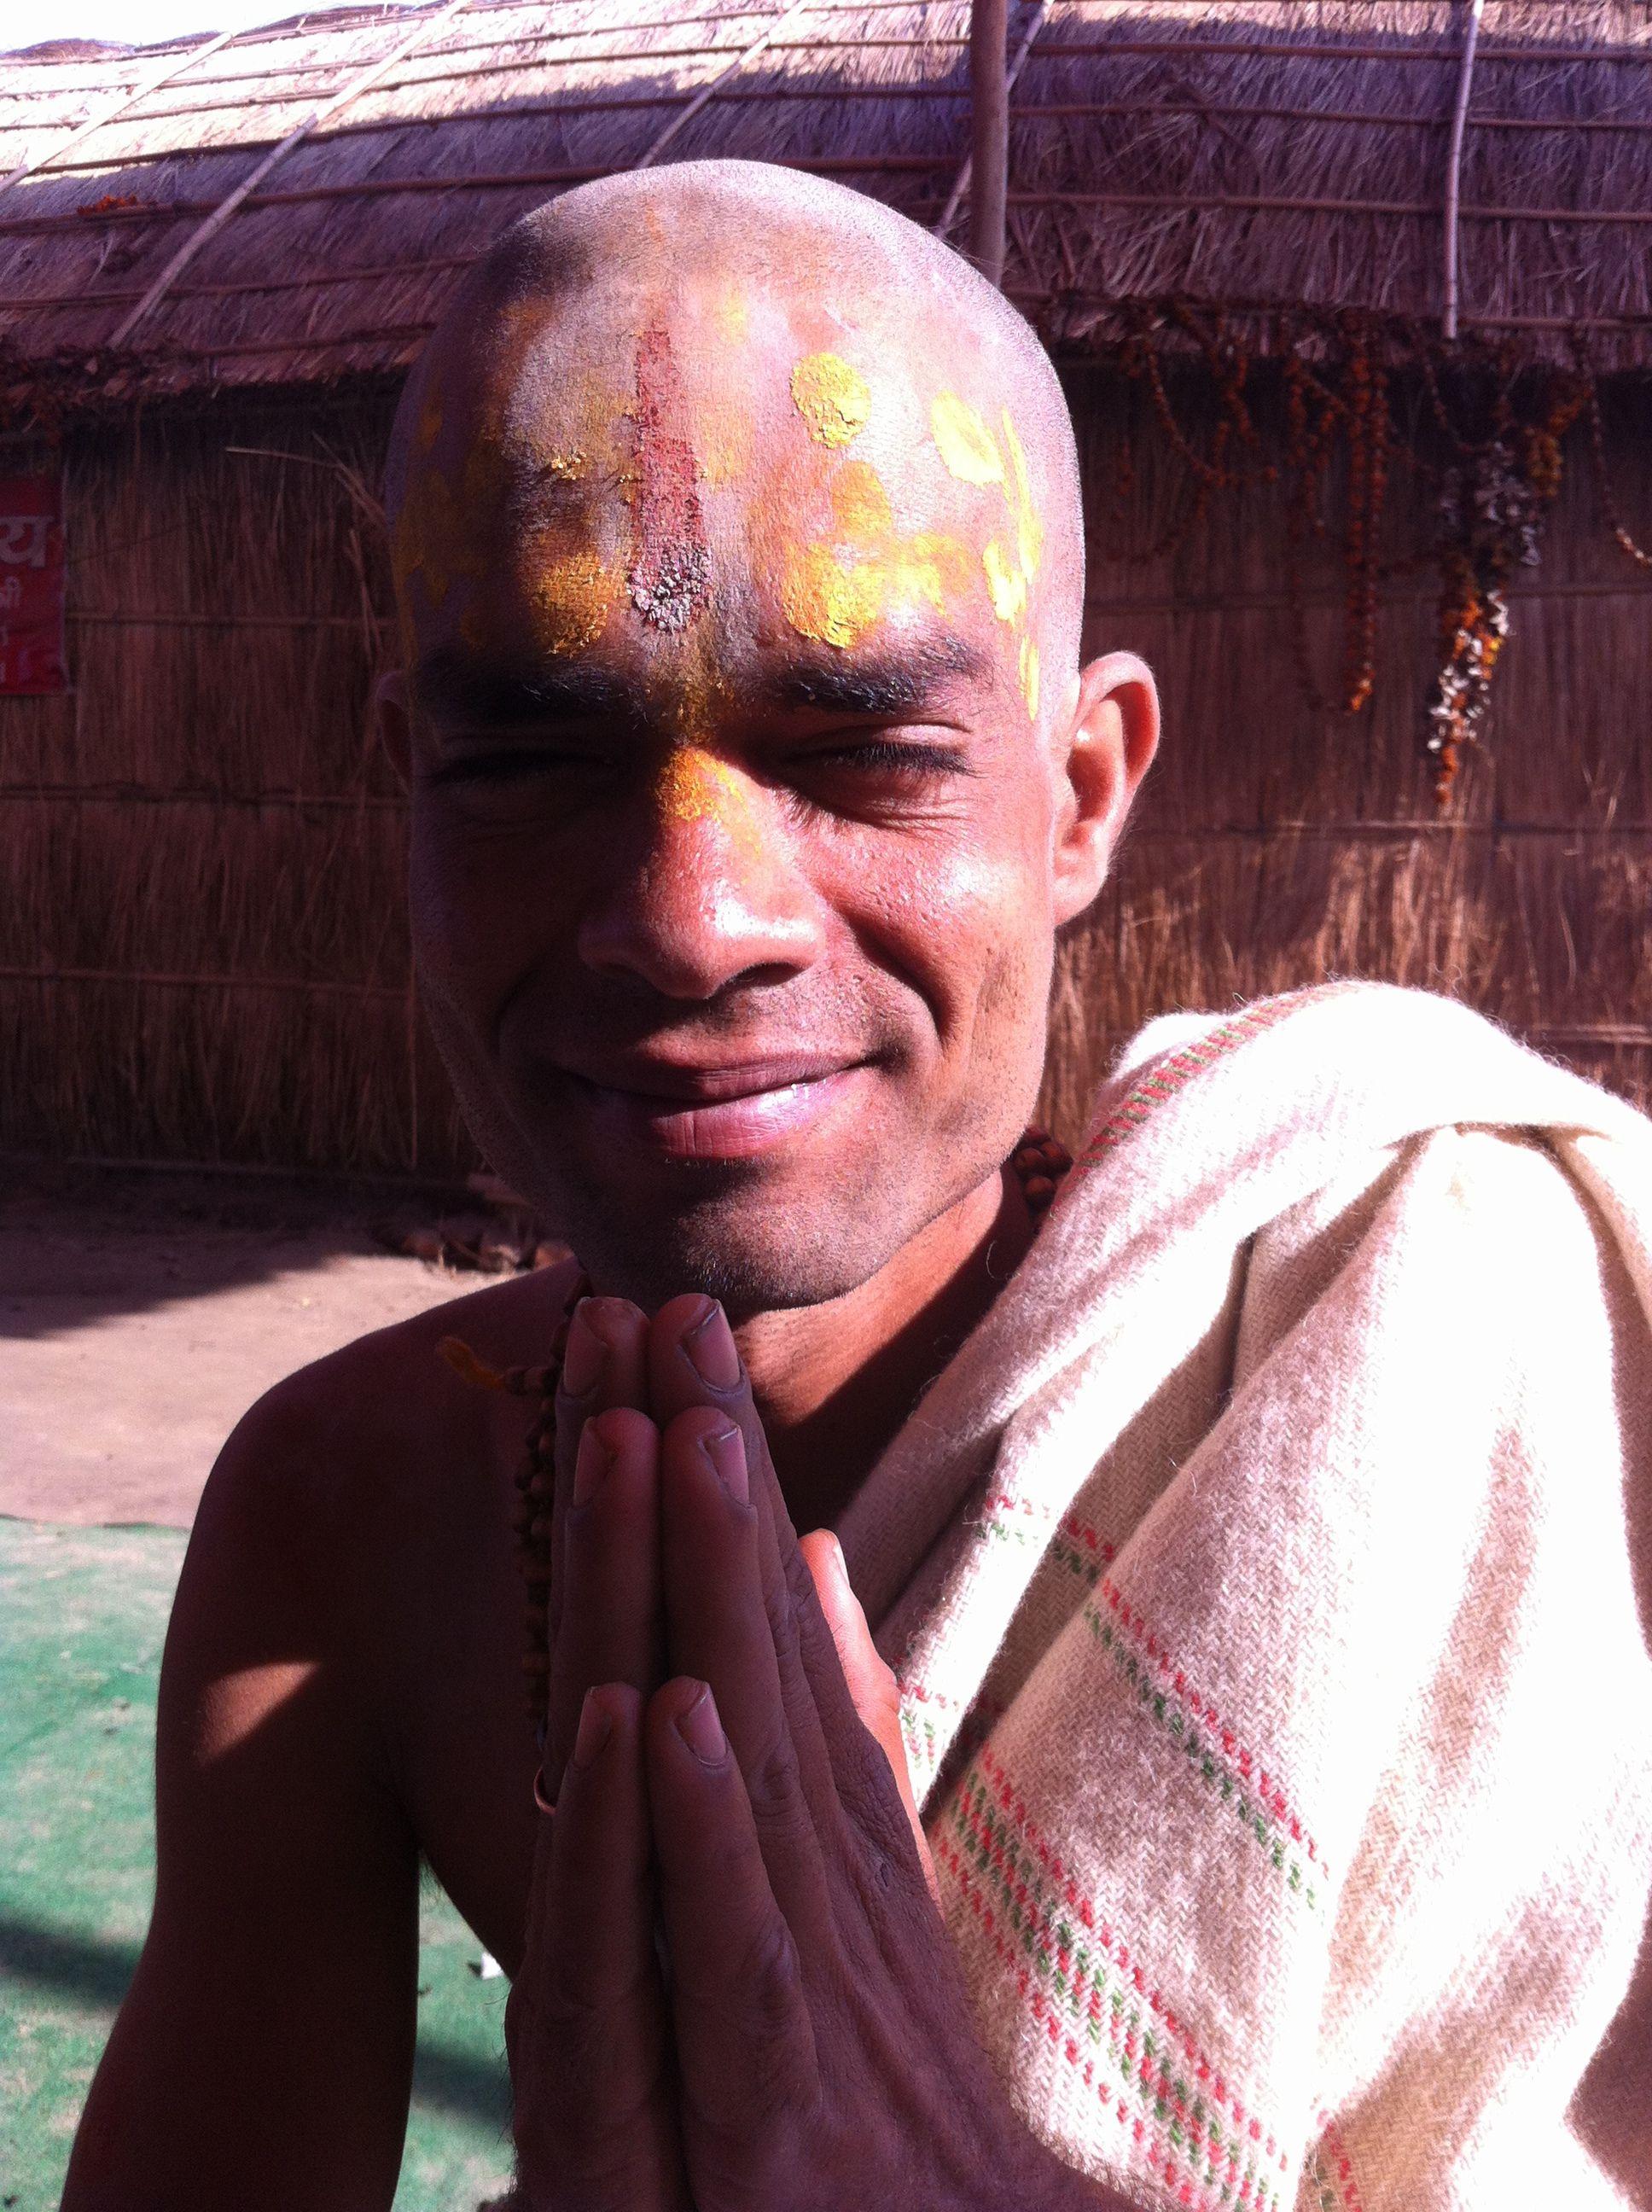 Hanuman Chalisa and Healing Mantra Seminar with Bharati in